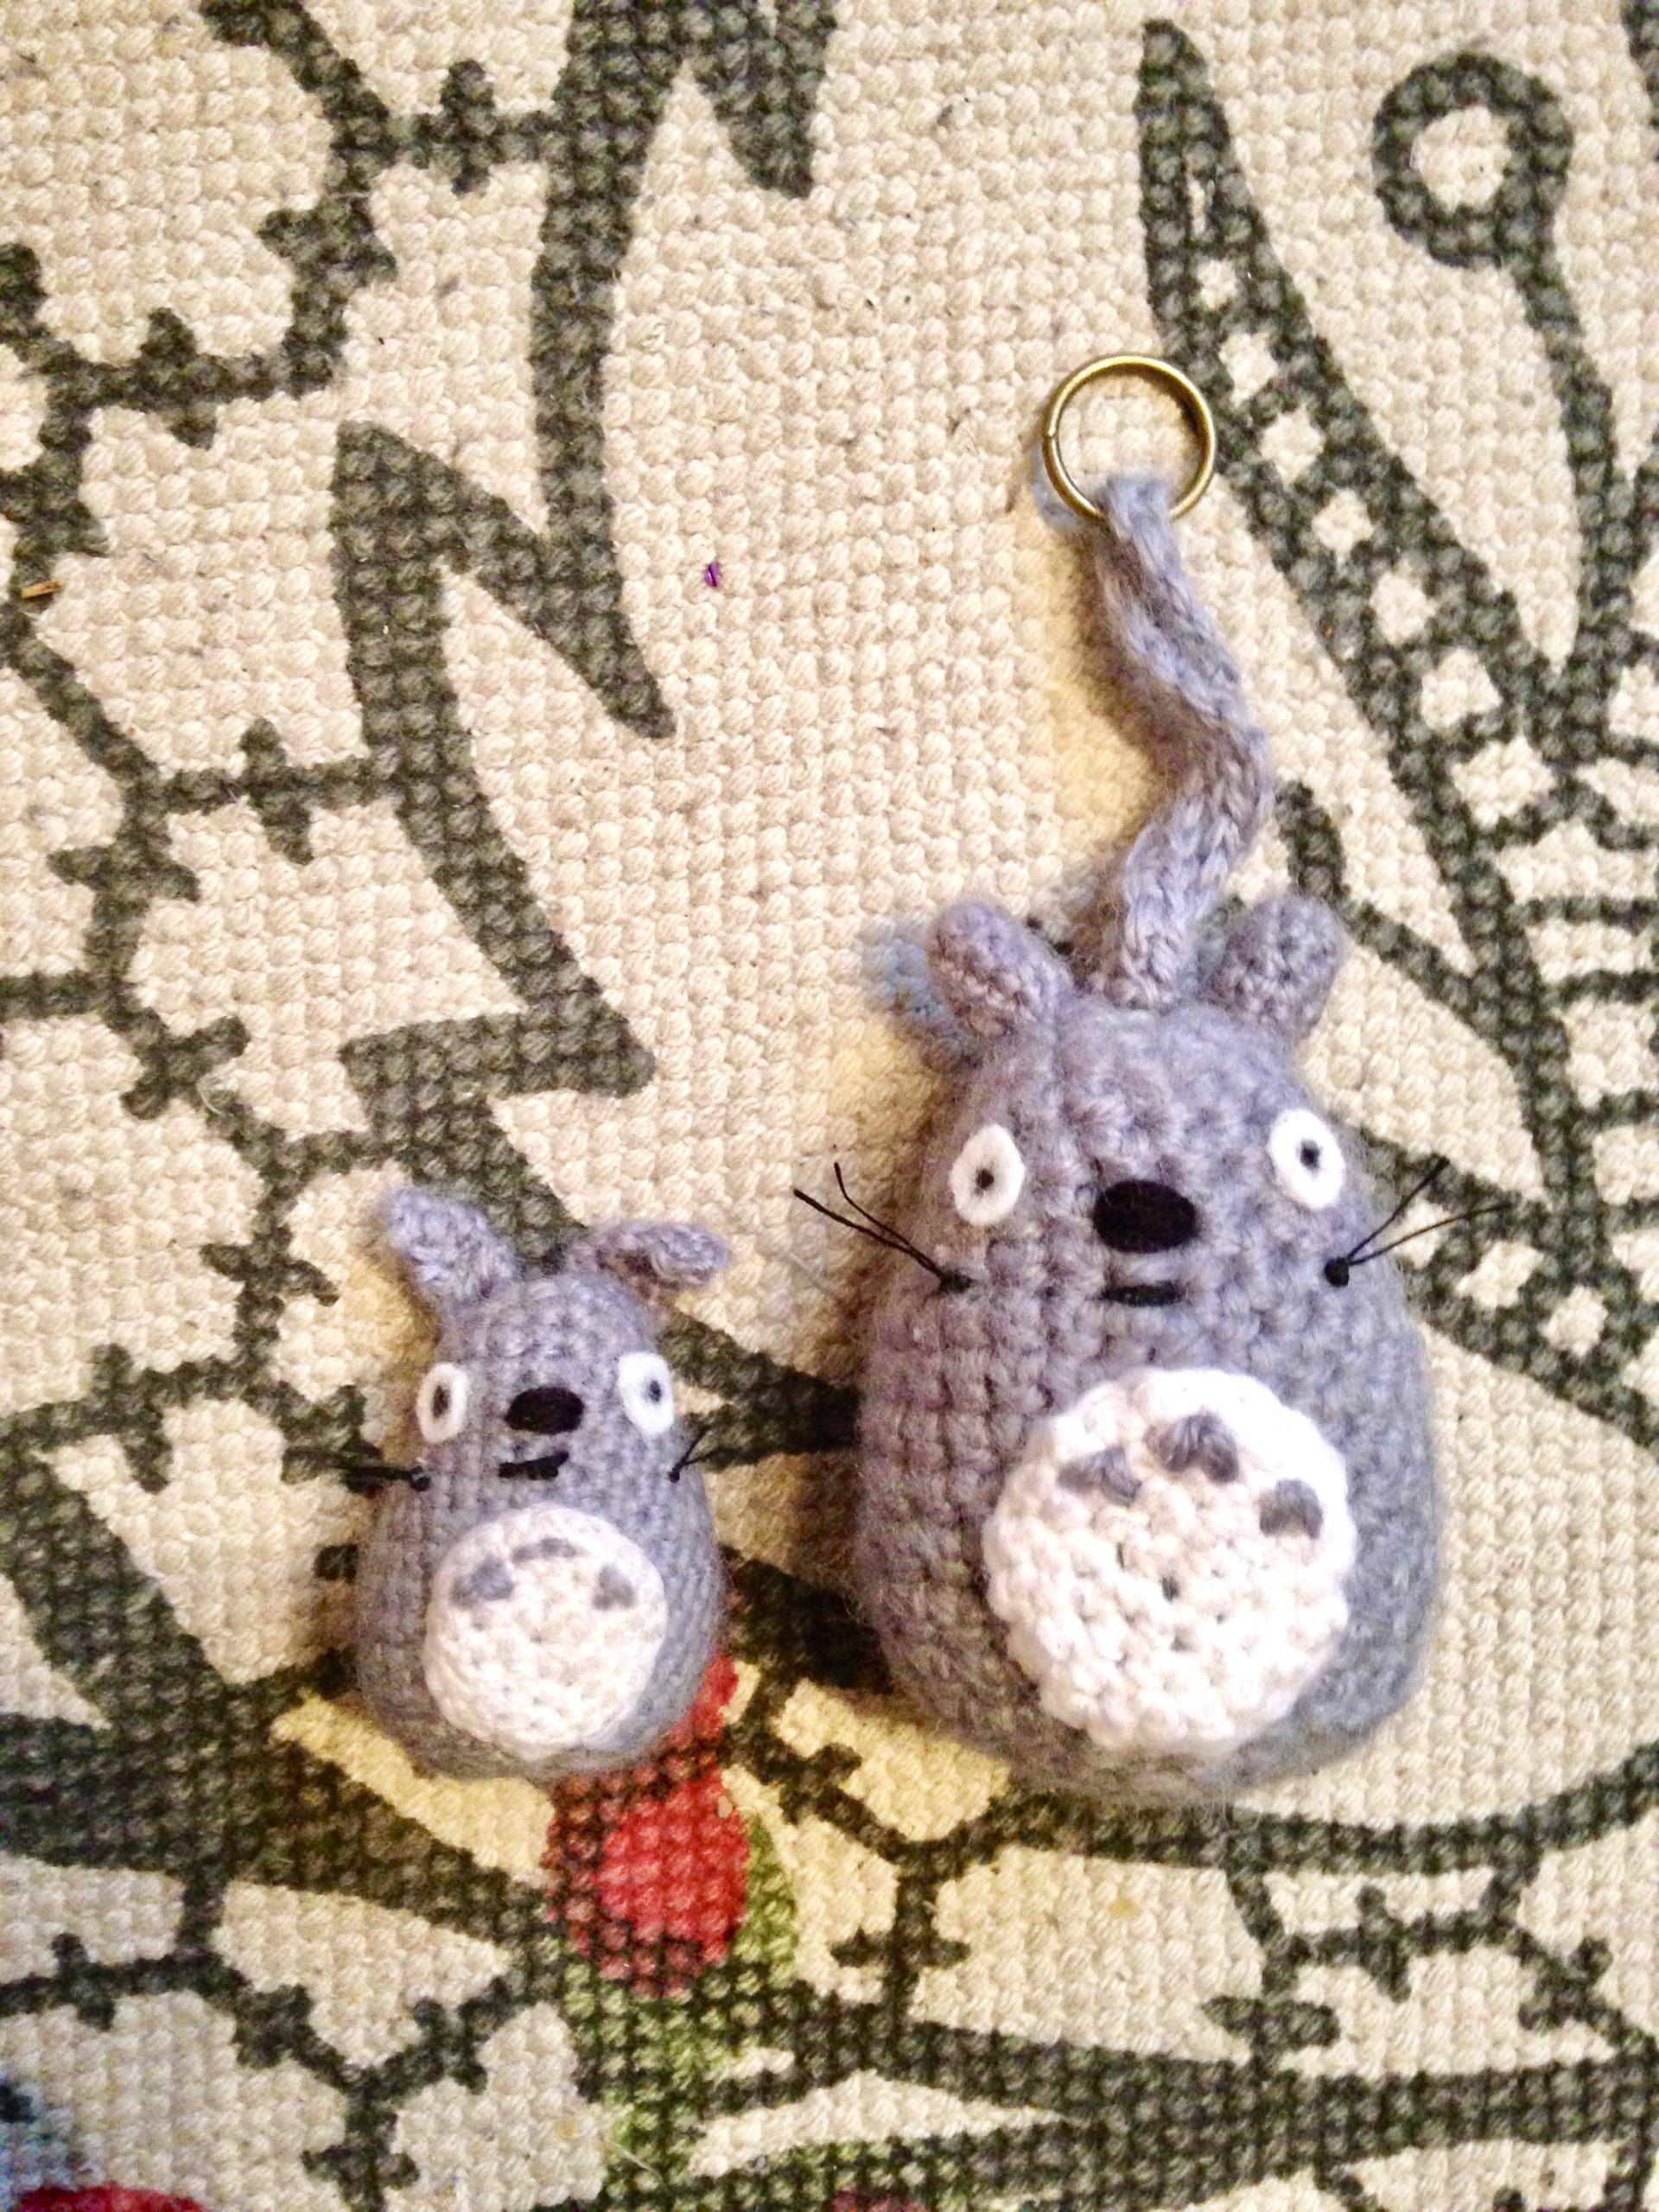 How to Crochet - Easy Beginners Amigurumi Shark Tutorial - YouTube | 2560x1920